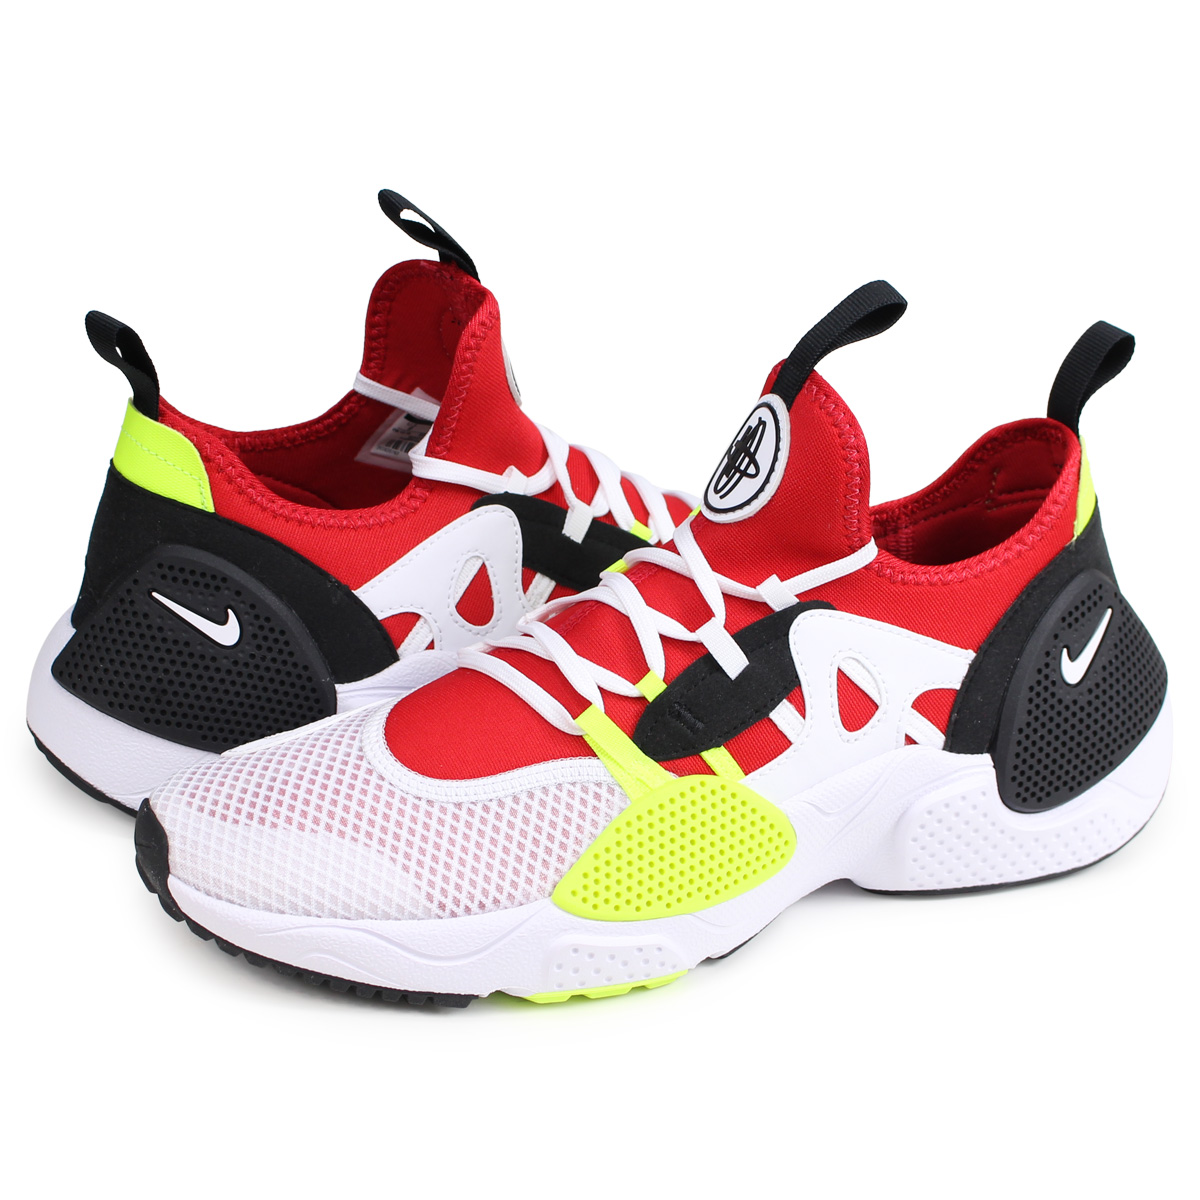 9e1f75433581f Nike NIKE エアハラチスニーカーメンズ AIR HUARACHE NIKE HUARACHE E.D.G.E. TXT red  AO1697-100  load planned Shinnyu load in reservation product 2 14 ...